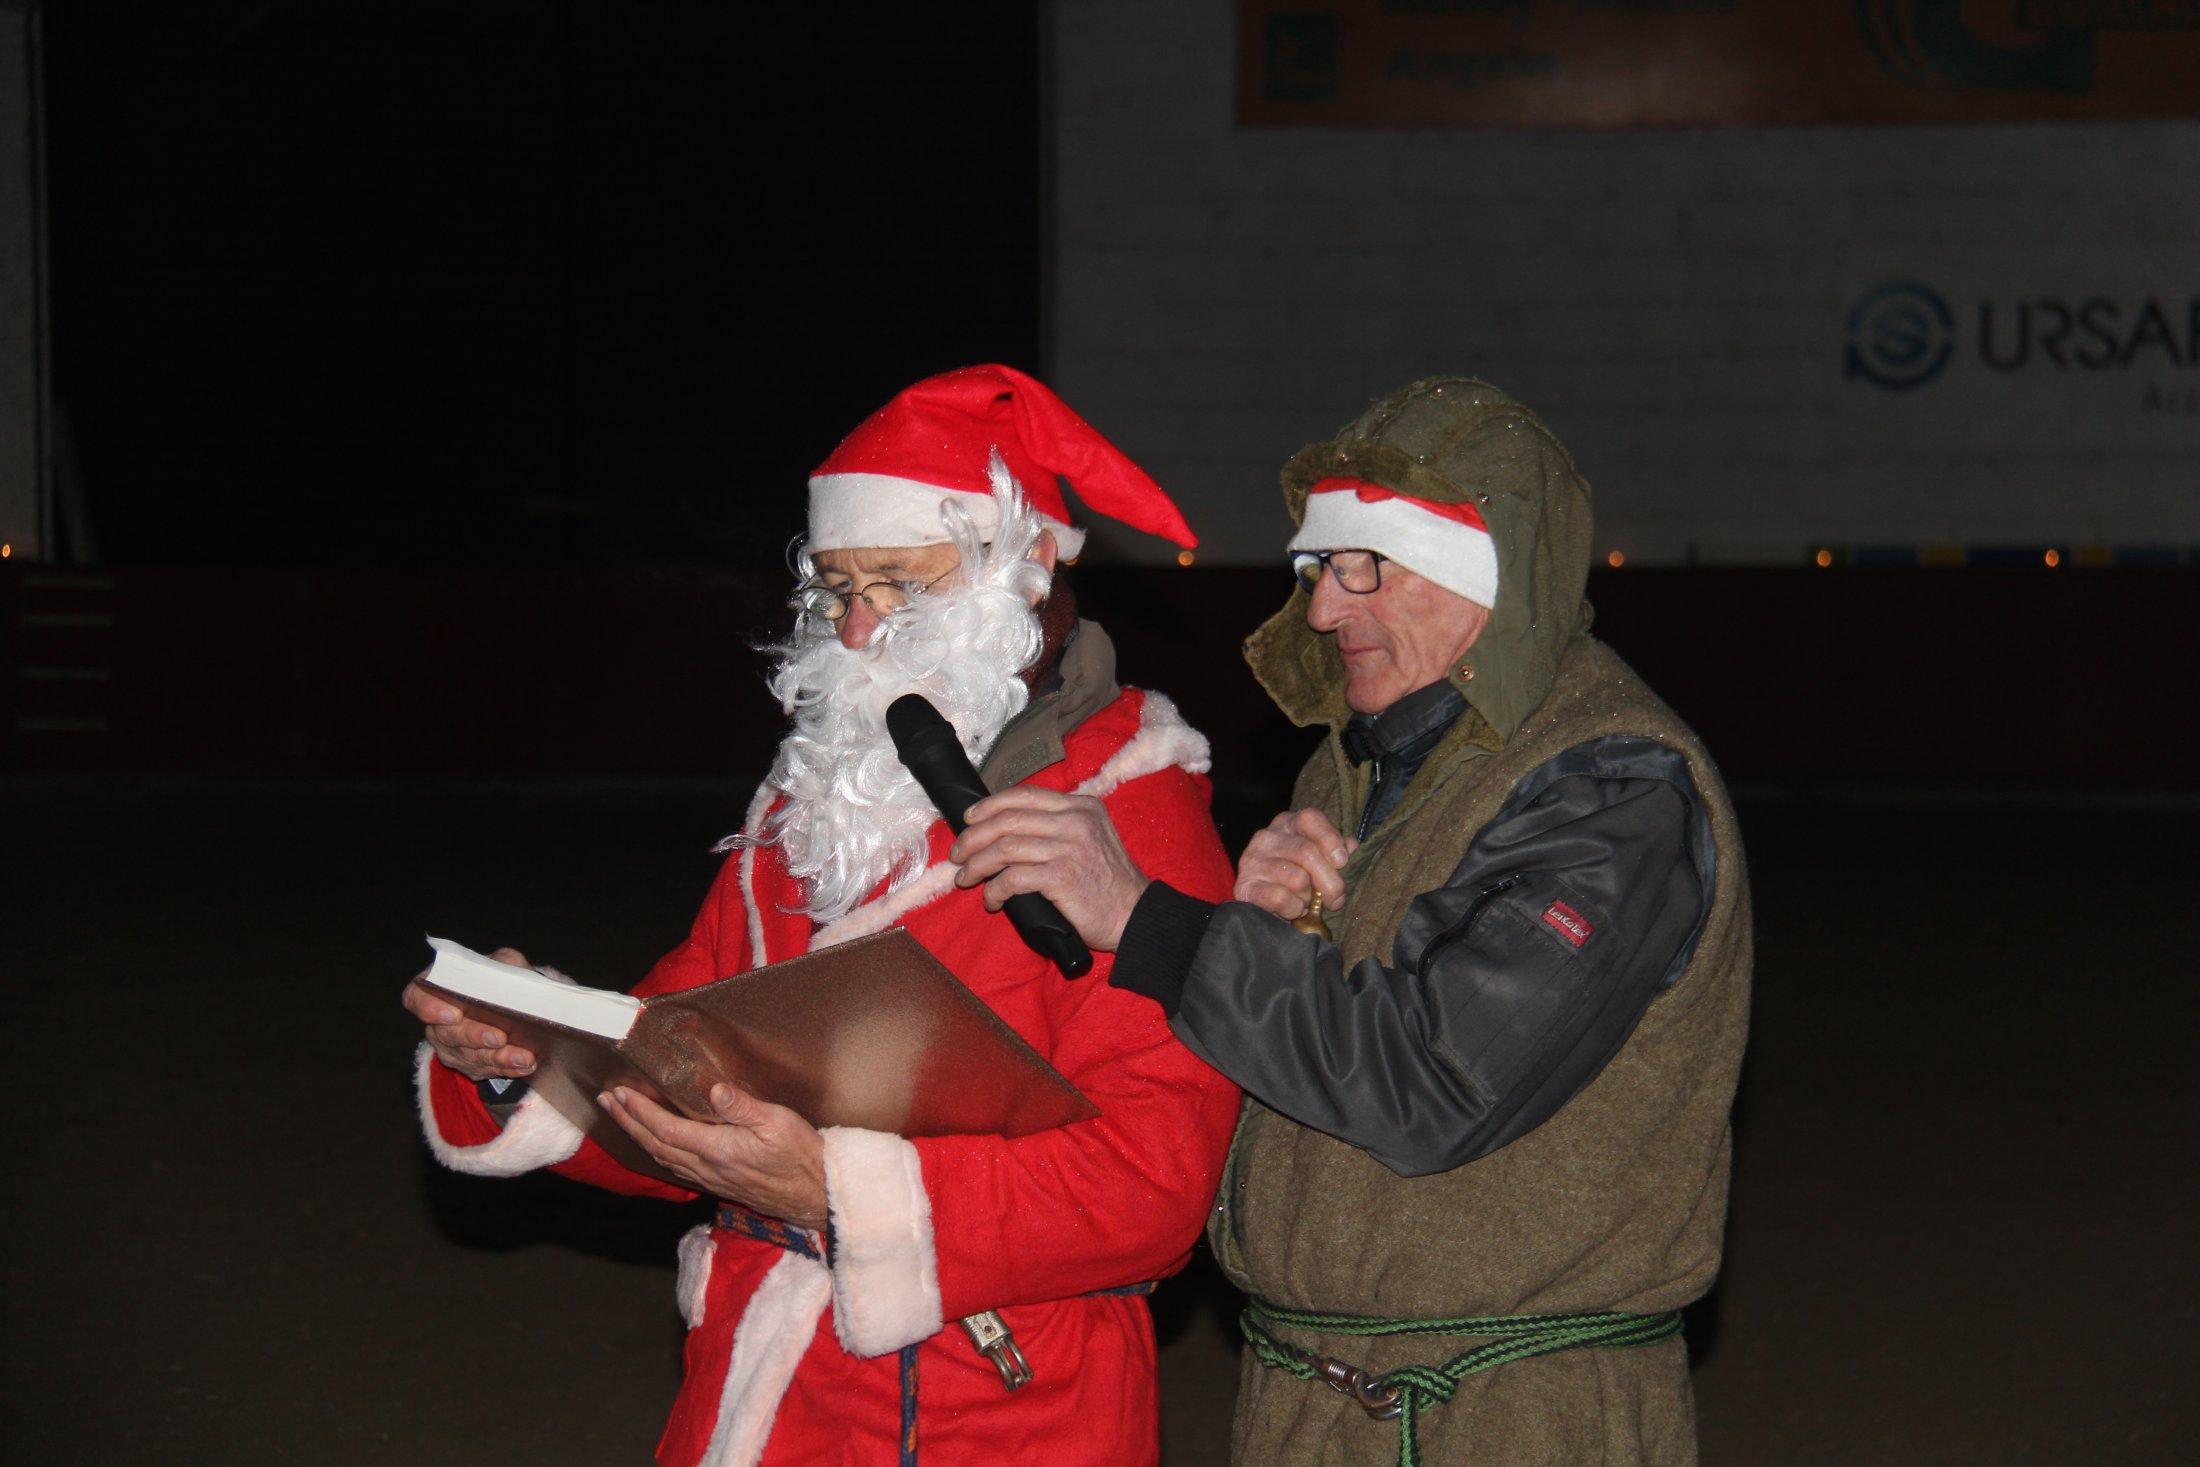 Weihnachtsfeier | Reiterverein Neunkirchen e.V.